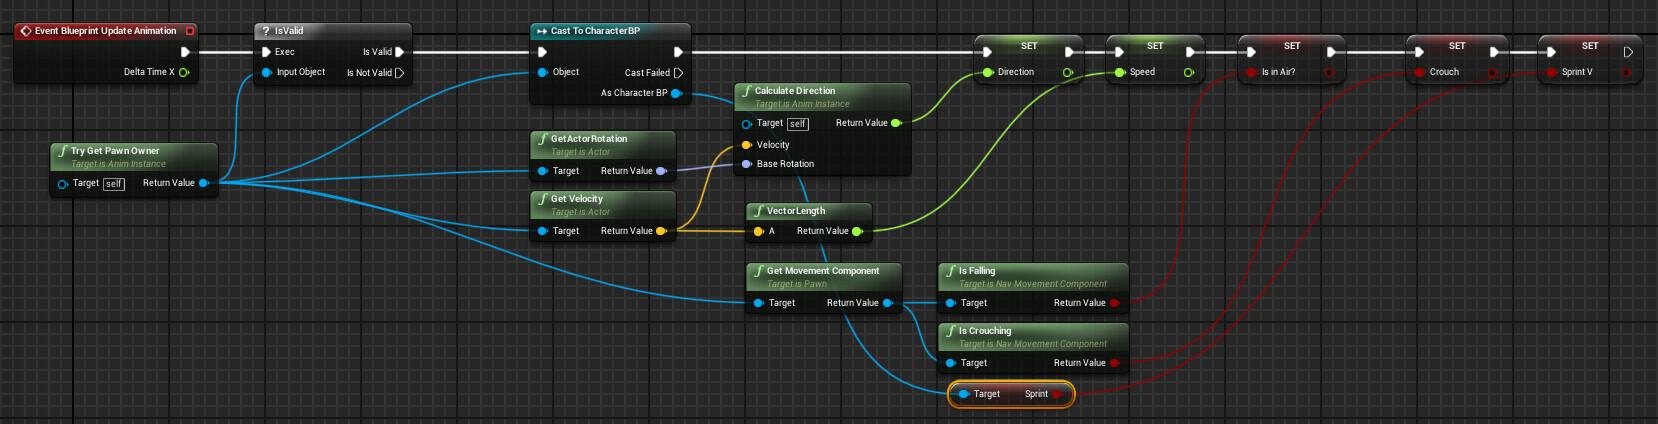 Stewart Bellamy - UE4 Character Animation Set